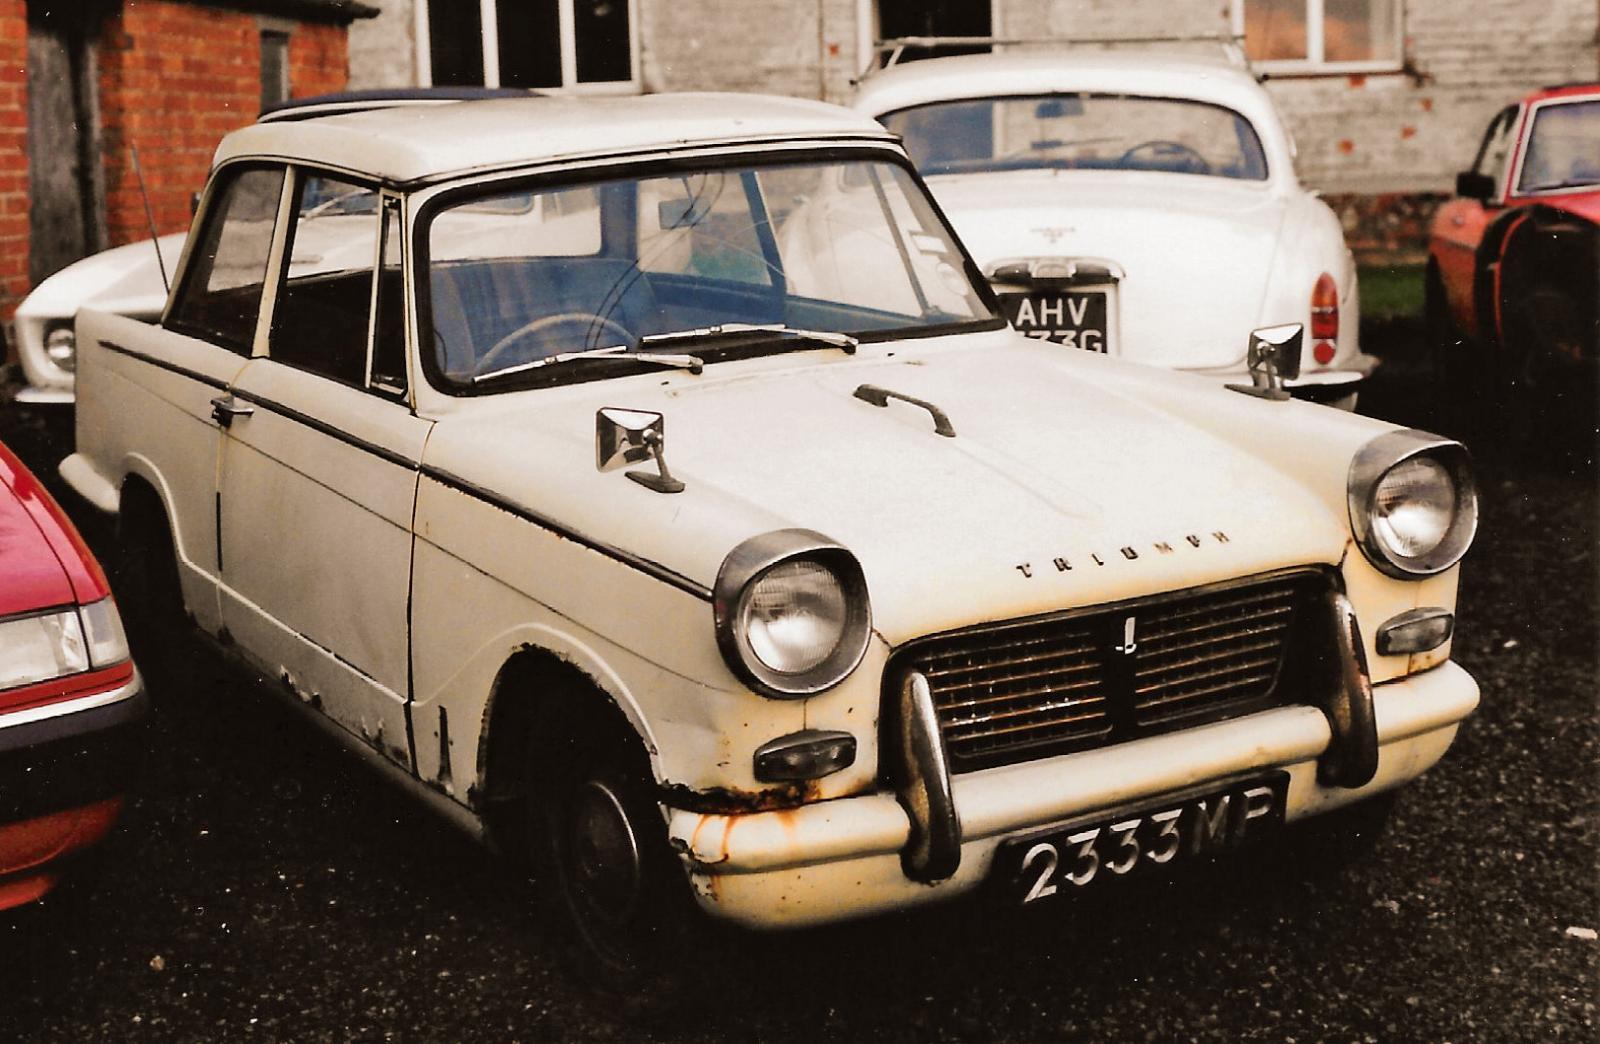 Herald 948cc n-s front broad.jpg